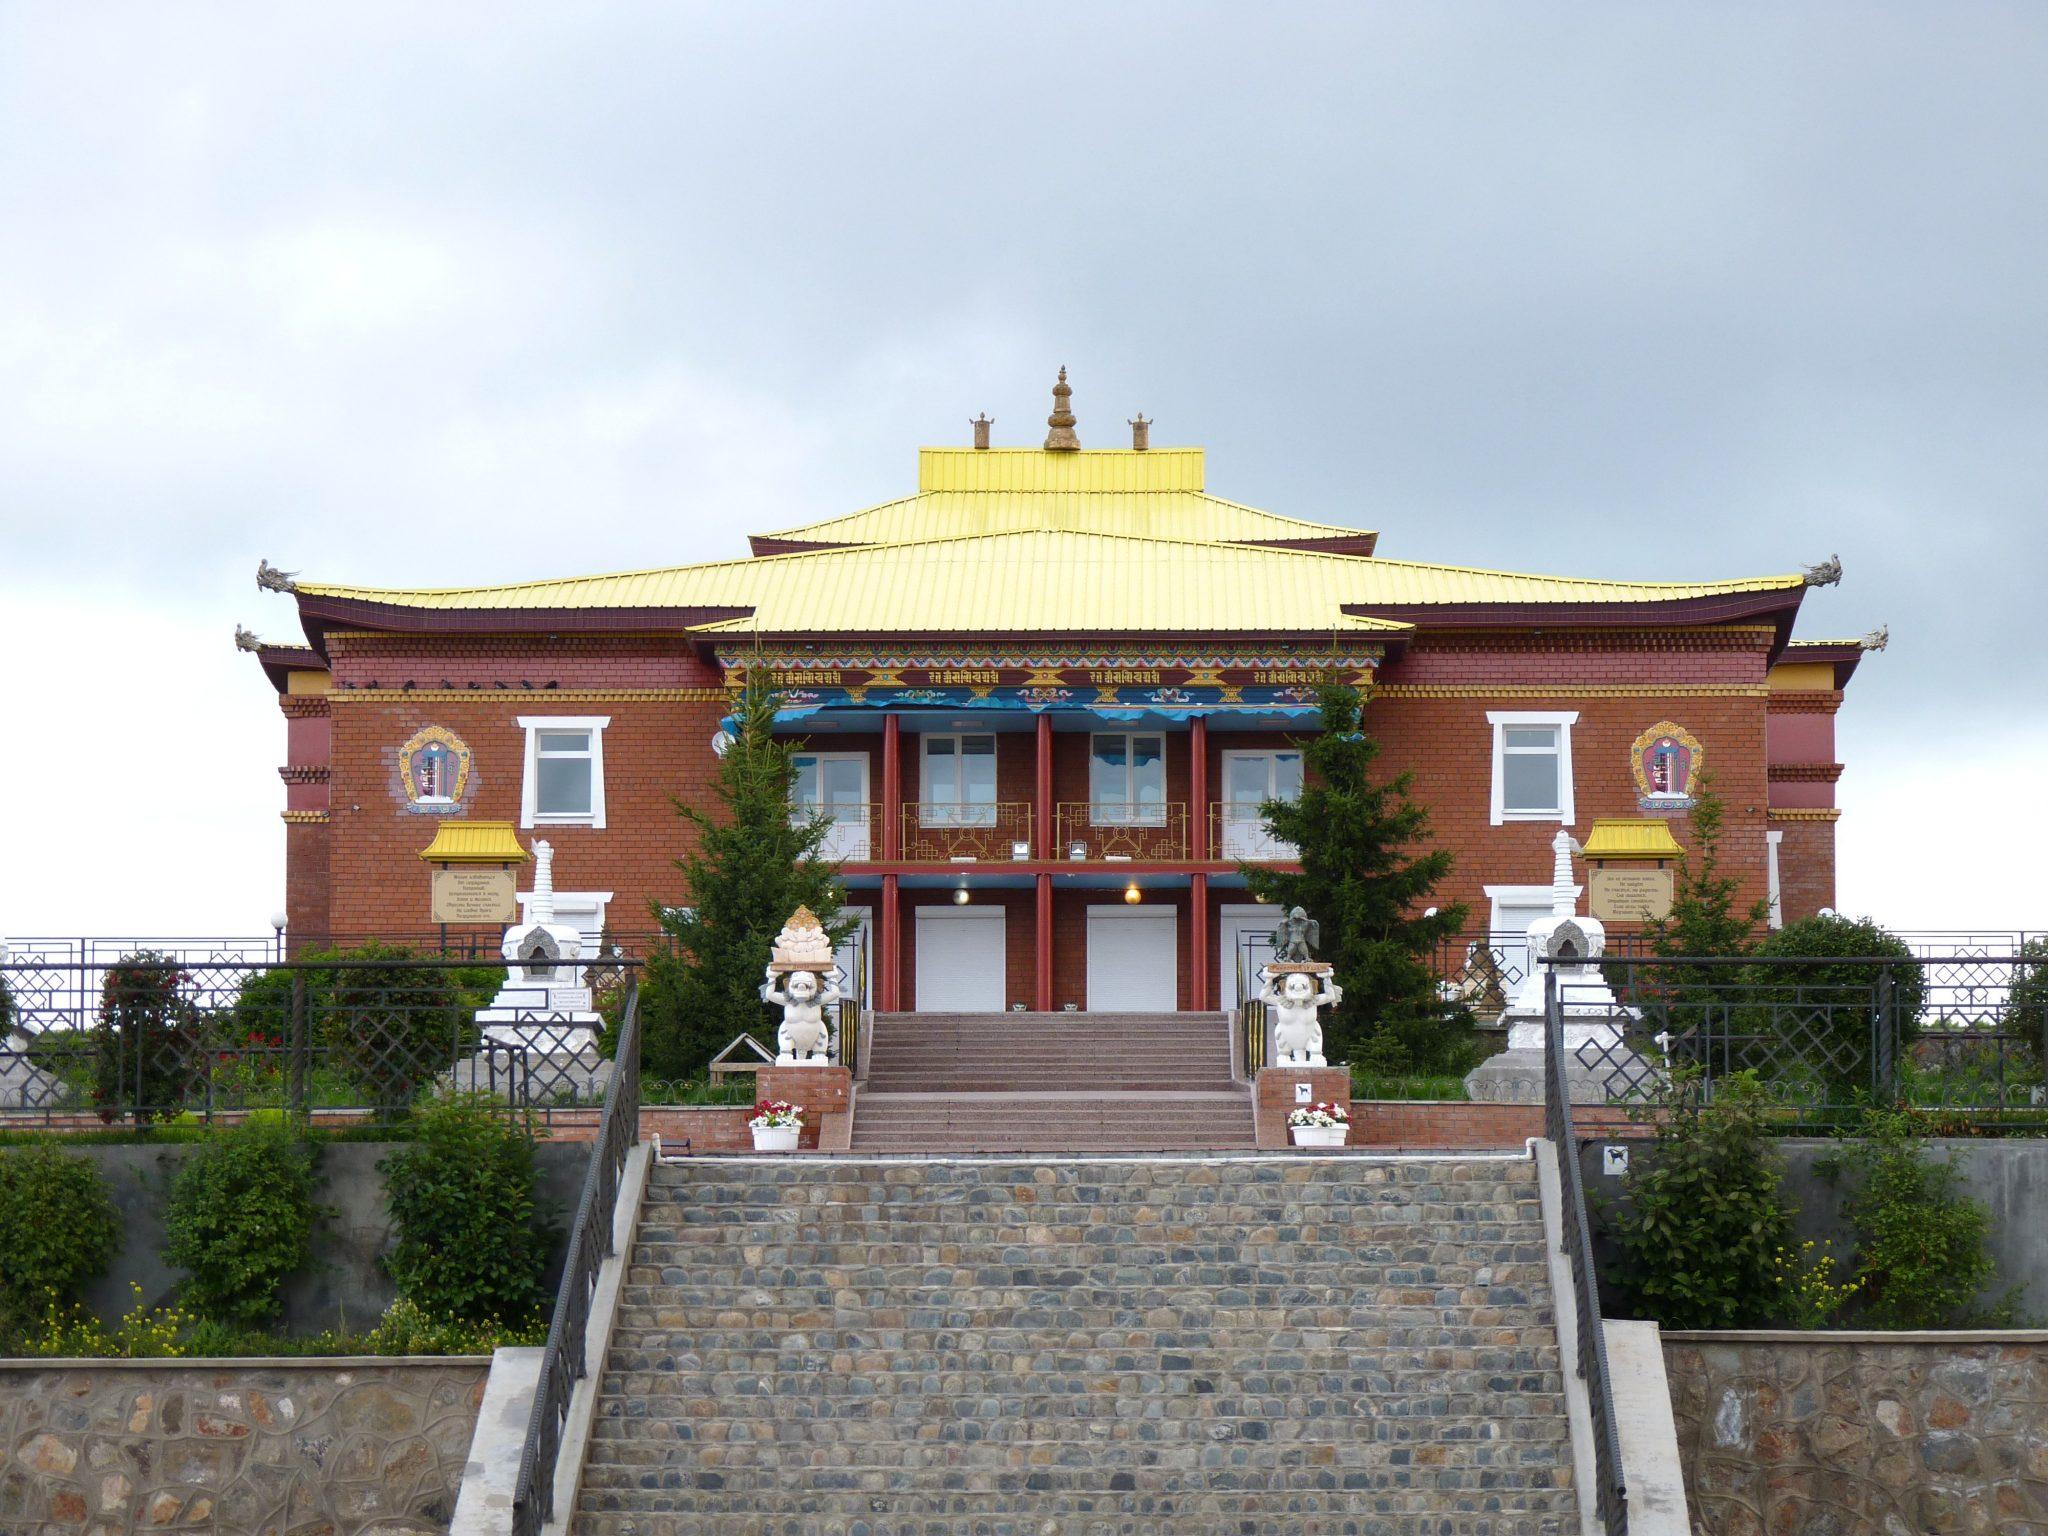 Rinpoche Bagsha 01 Ulan-Ude Rússia Mundo Indefinido